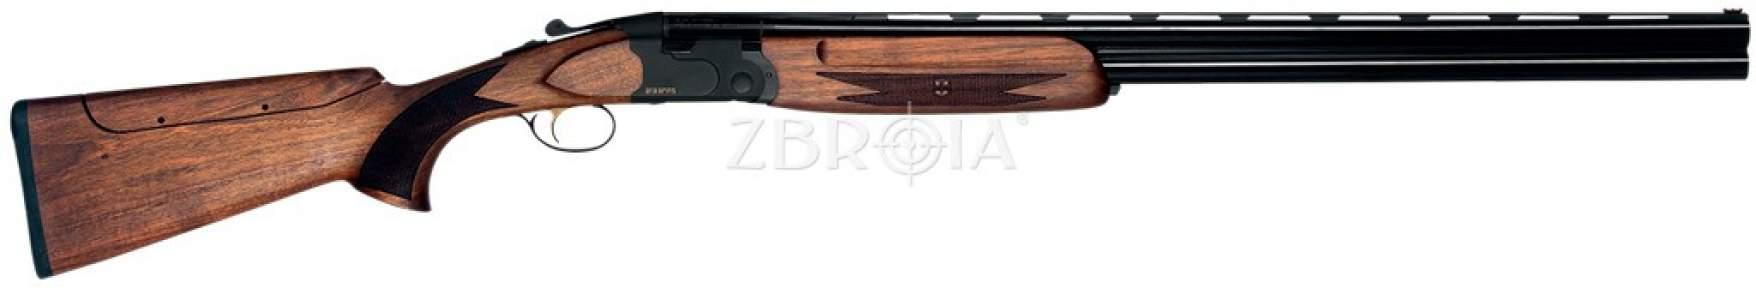 Ружье Ata Arms SP Sporter кал. 12/76